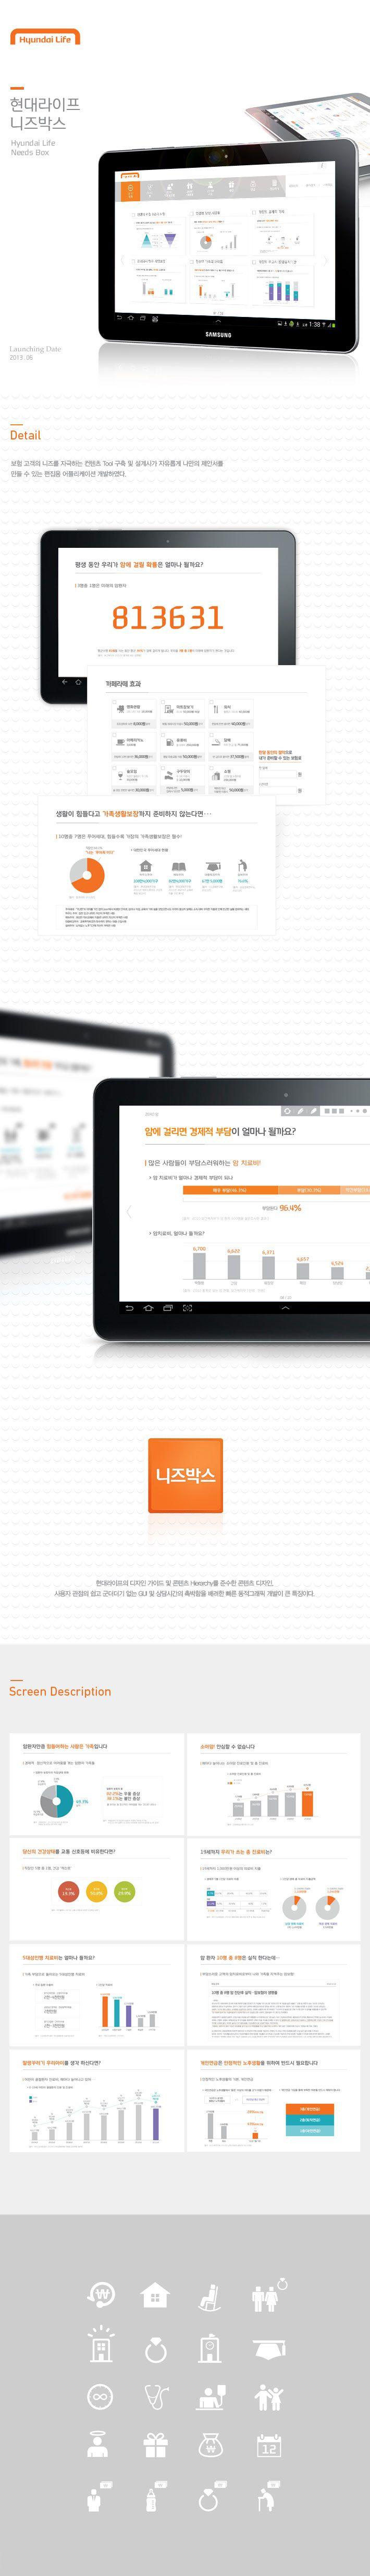 Hyundai Life ESS by Eda communications